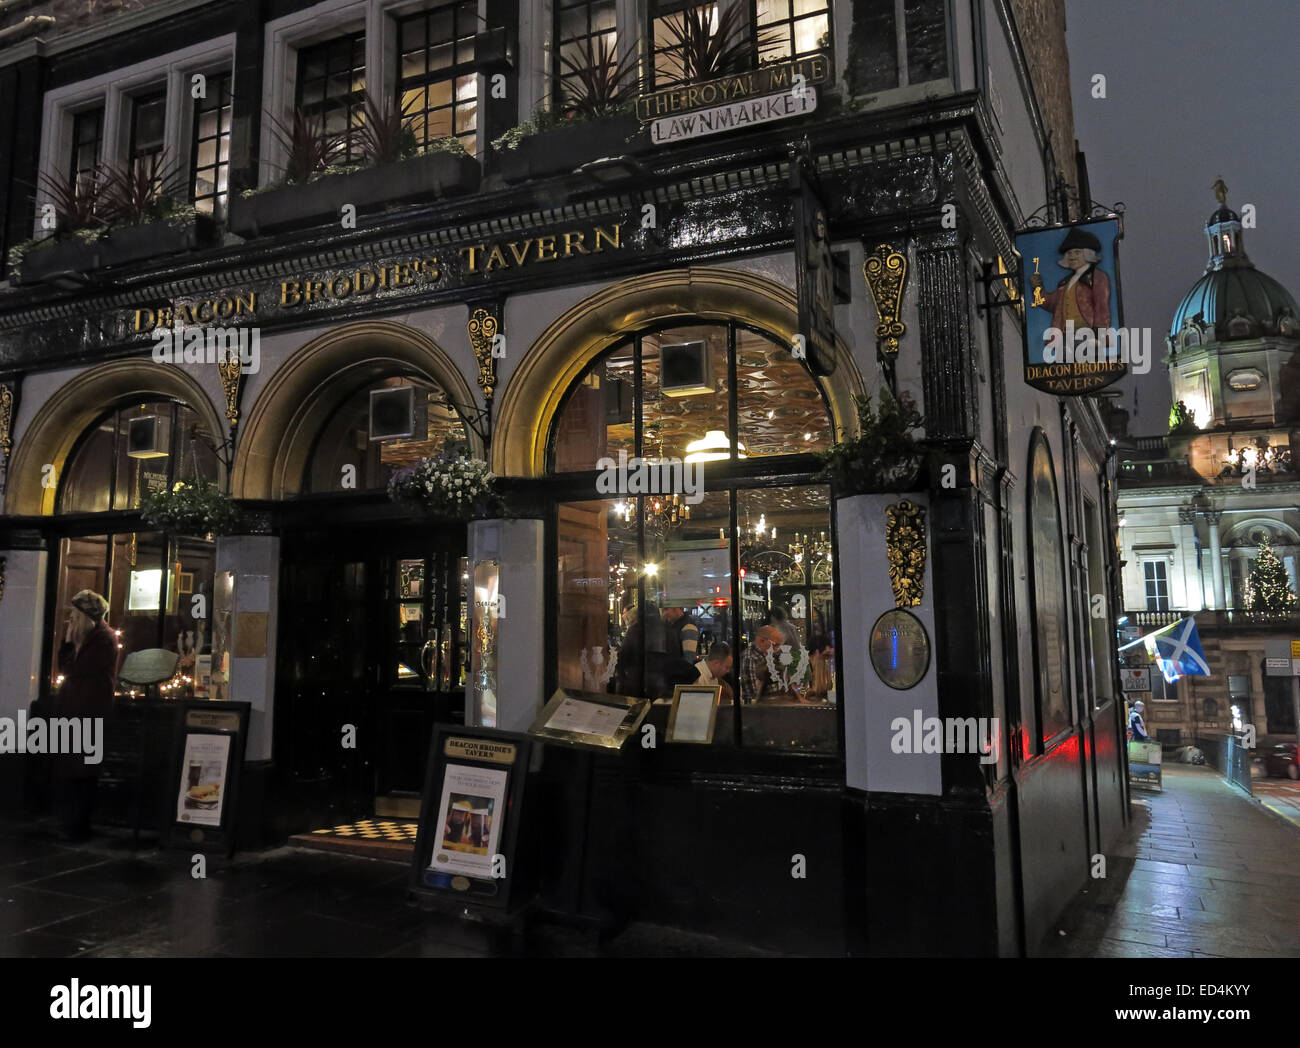 Lawnmarket,night,dark,Scotland at dusk,classic,pub,bar,ale,alehouse,Victorian,britain,british,city,color,colour,deacon brodies tavern,destination,drinking,edinburgh,europe,european,exterior,facade,house,kingdom,local,location,metropolitan,place,premises,pub,public,scottish,Gotonysmith,Scotland,scots,scottish,sightseeing,tour,tourism,tourist,travel,uk,united,urban,visit,visitor,world,Buy Pictures of,Buy Images Of